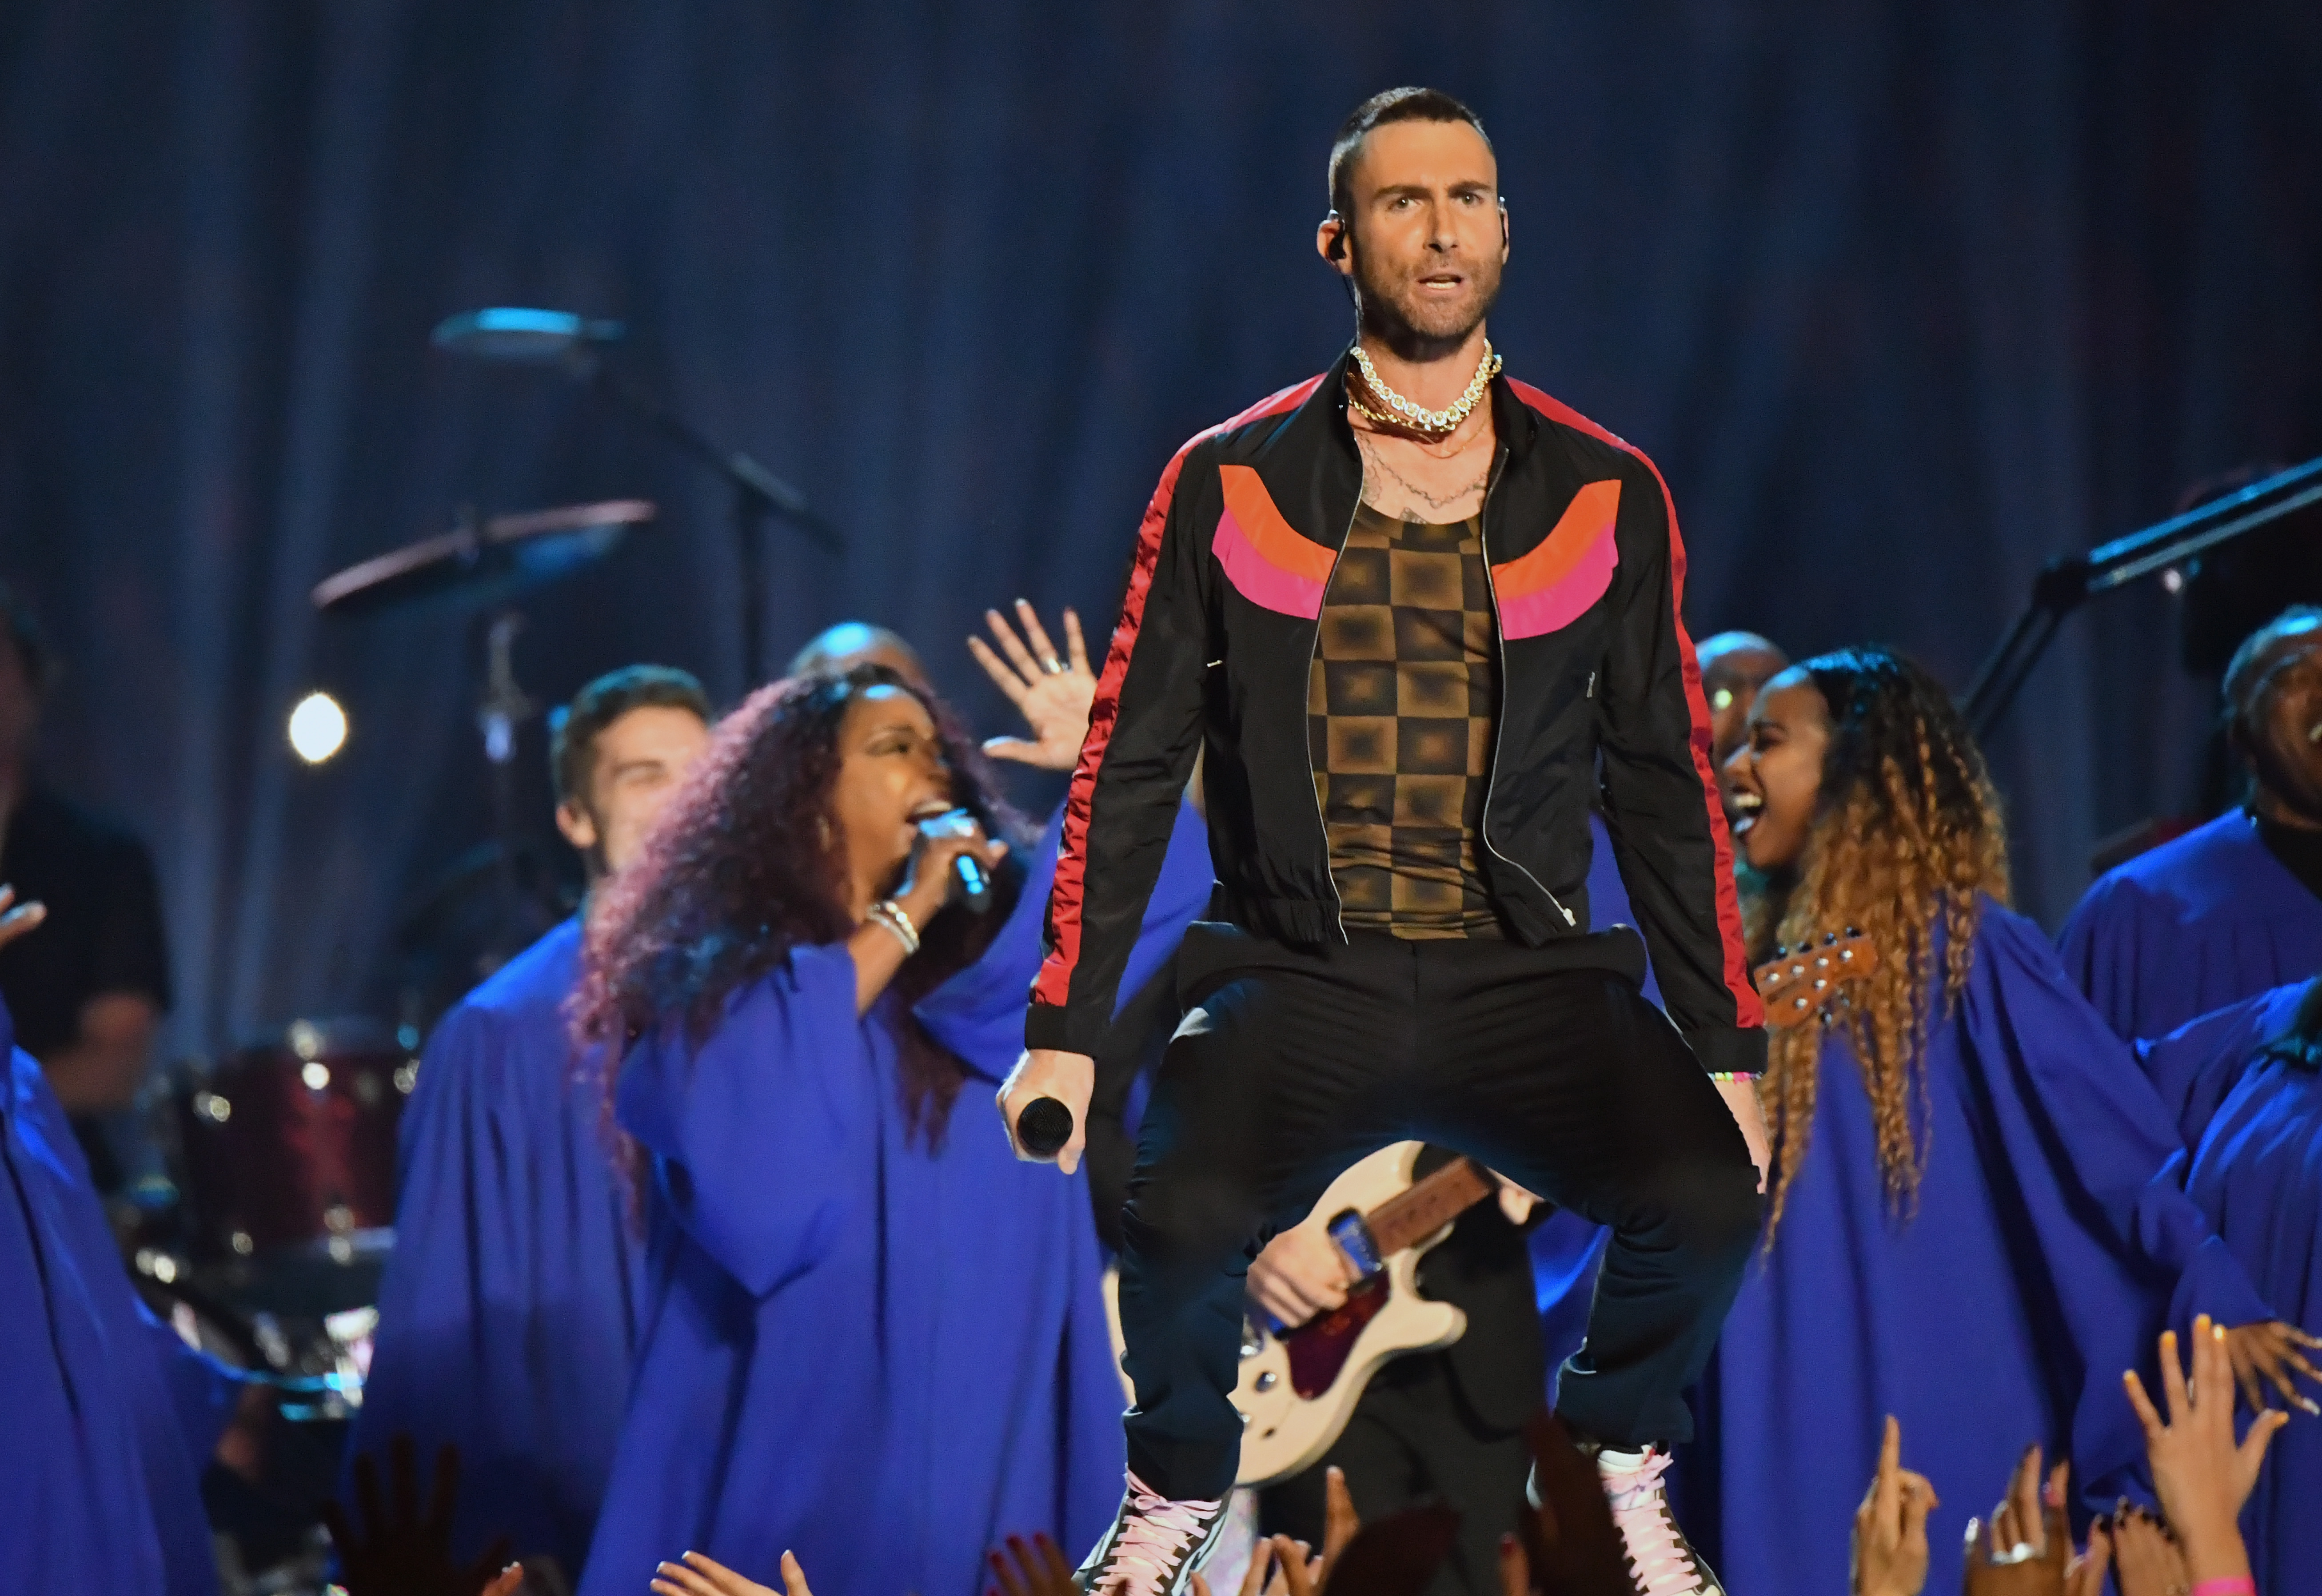 Adam Levine of Maroon 5 performs during the Pepsi Super Bowl 53 Halftime Show at Mercedes-Benz Stadium on February 3, 2019 in Atlanta, Georgia.